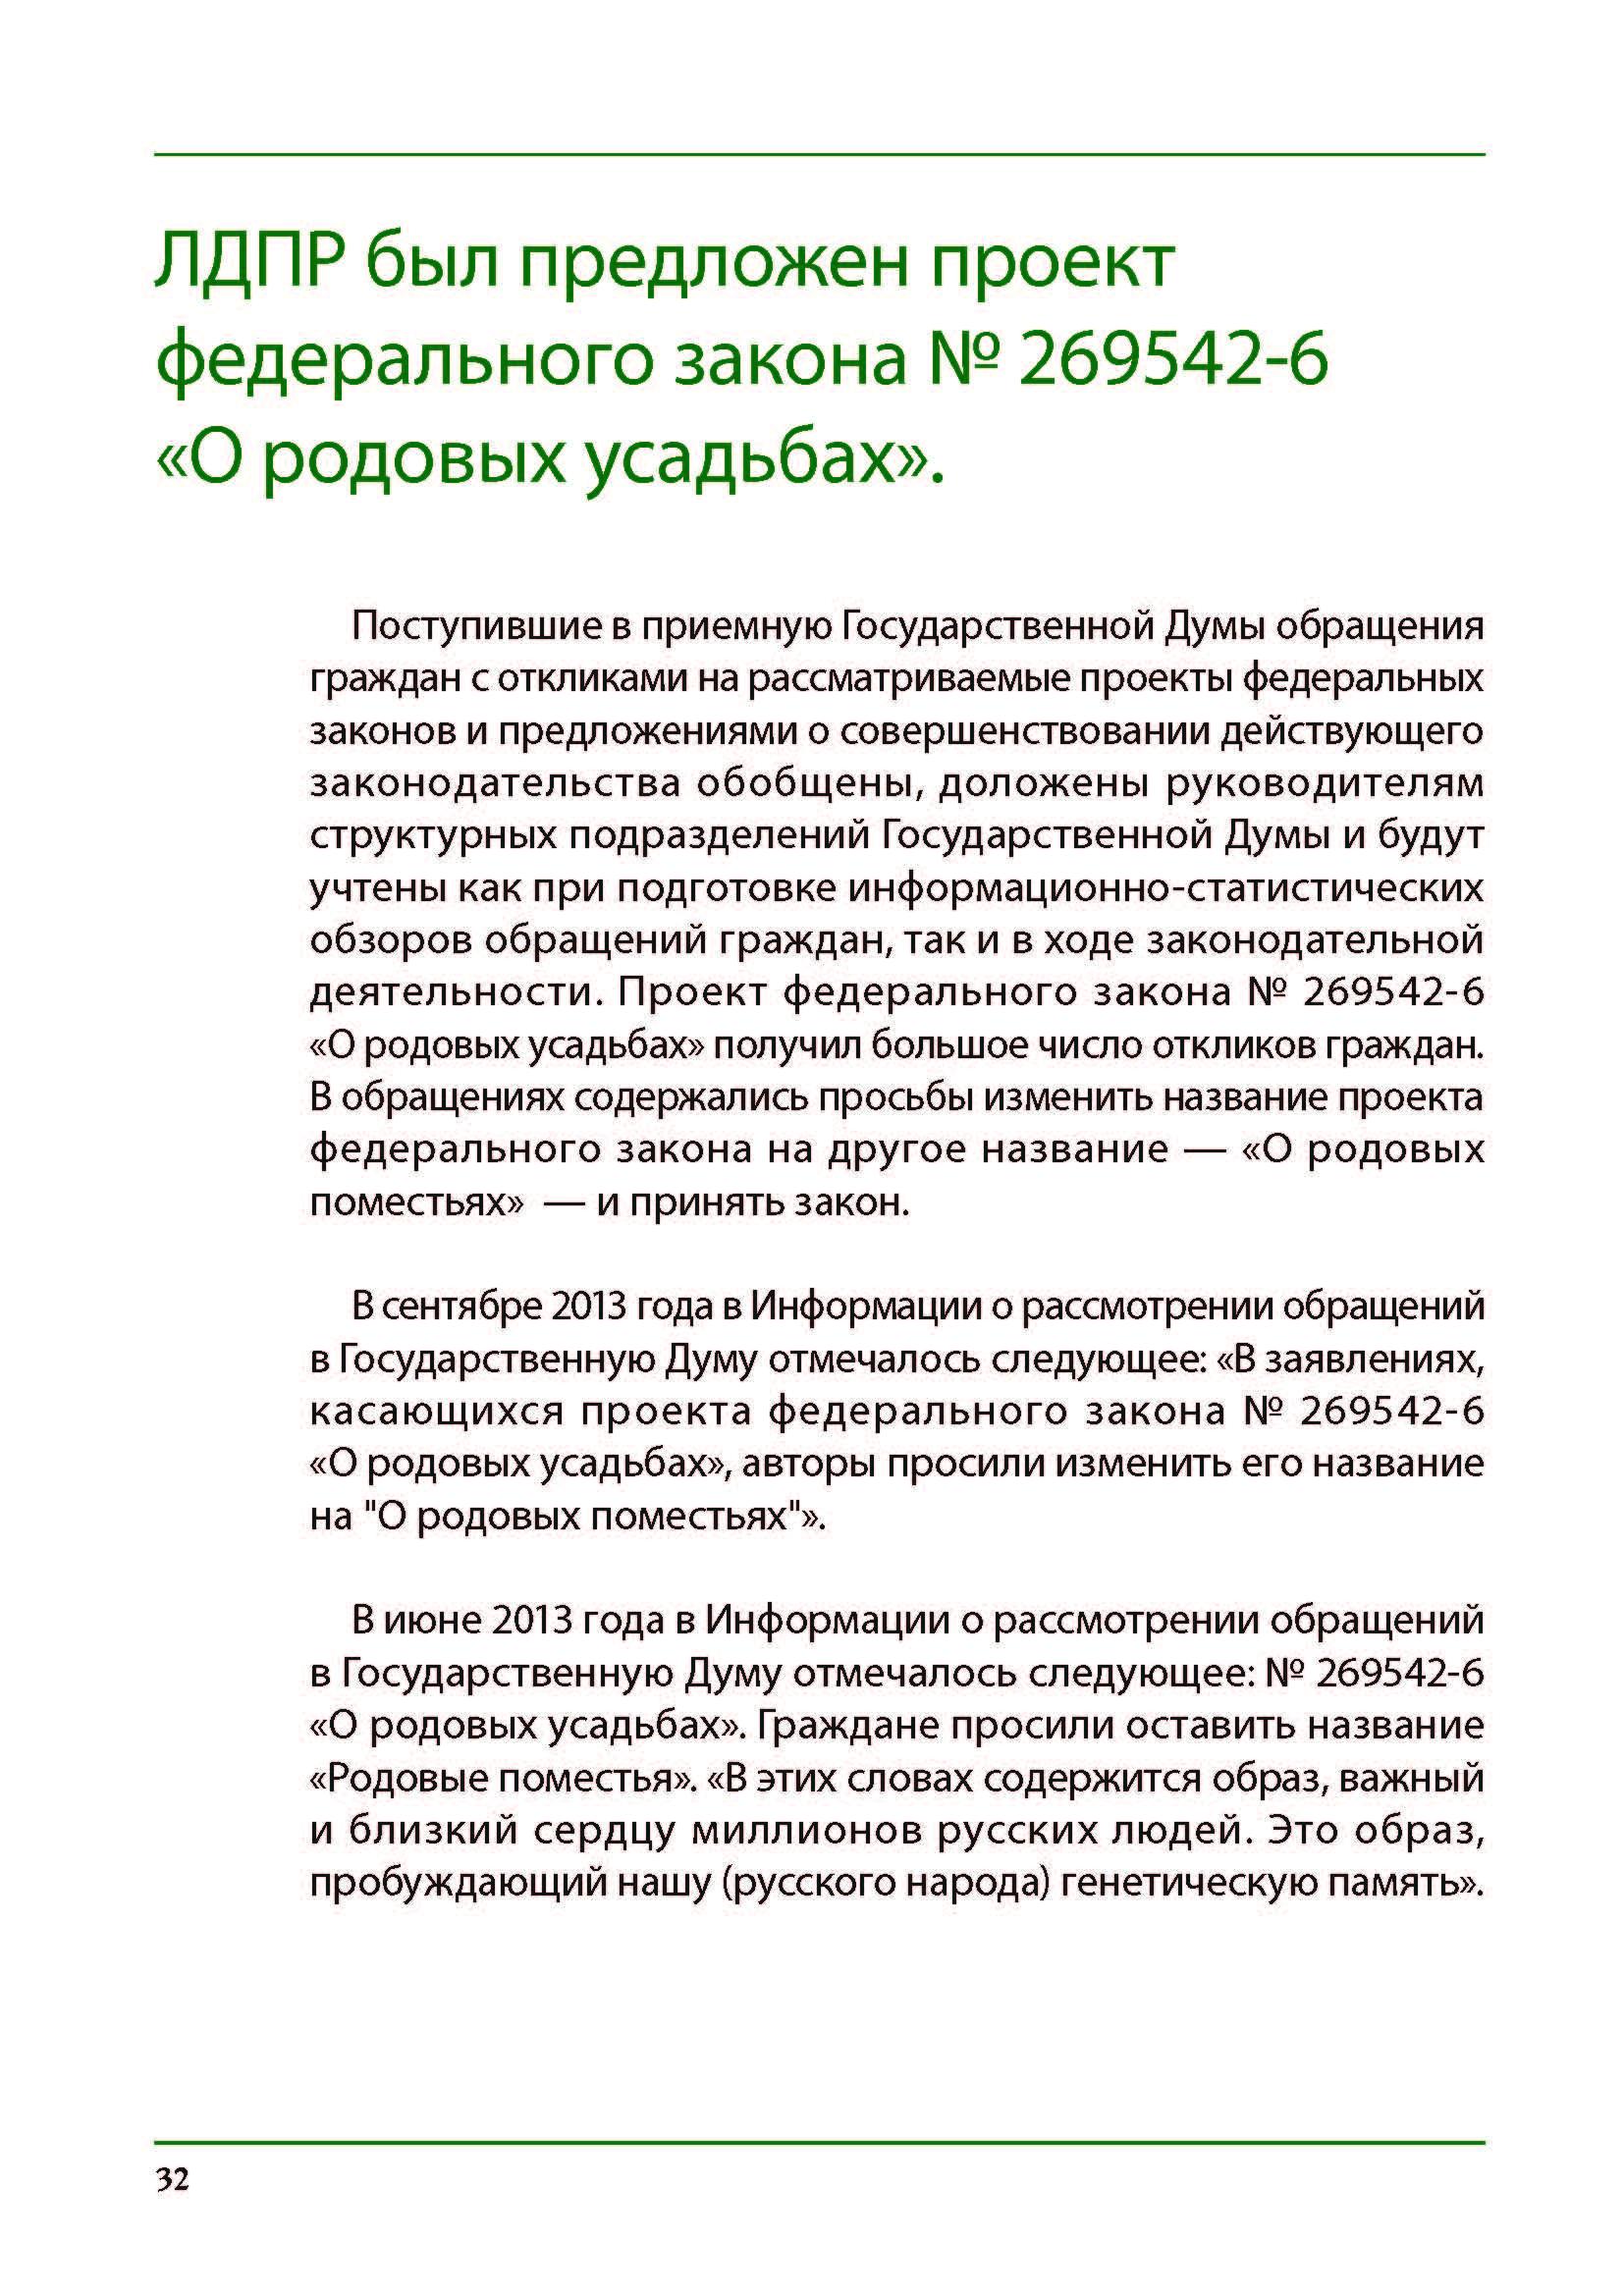 Фонд Поправка Конституция (32).jpg